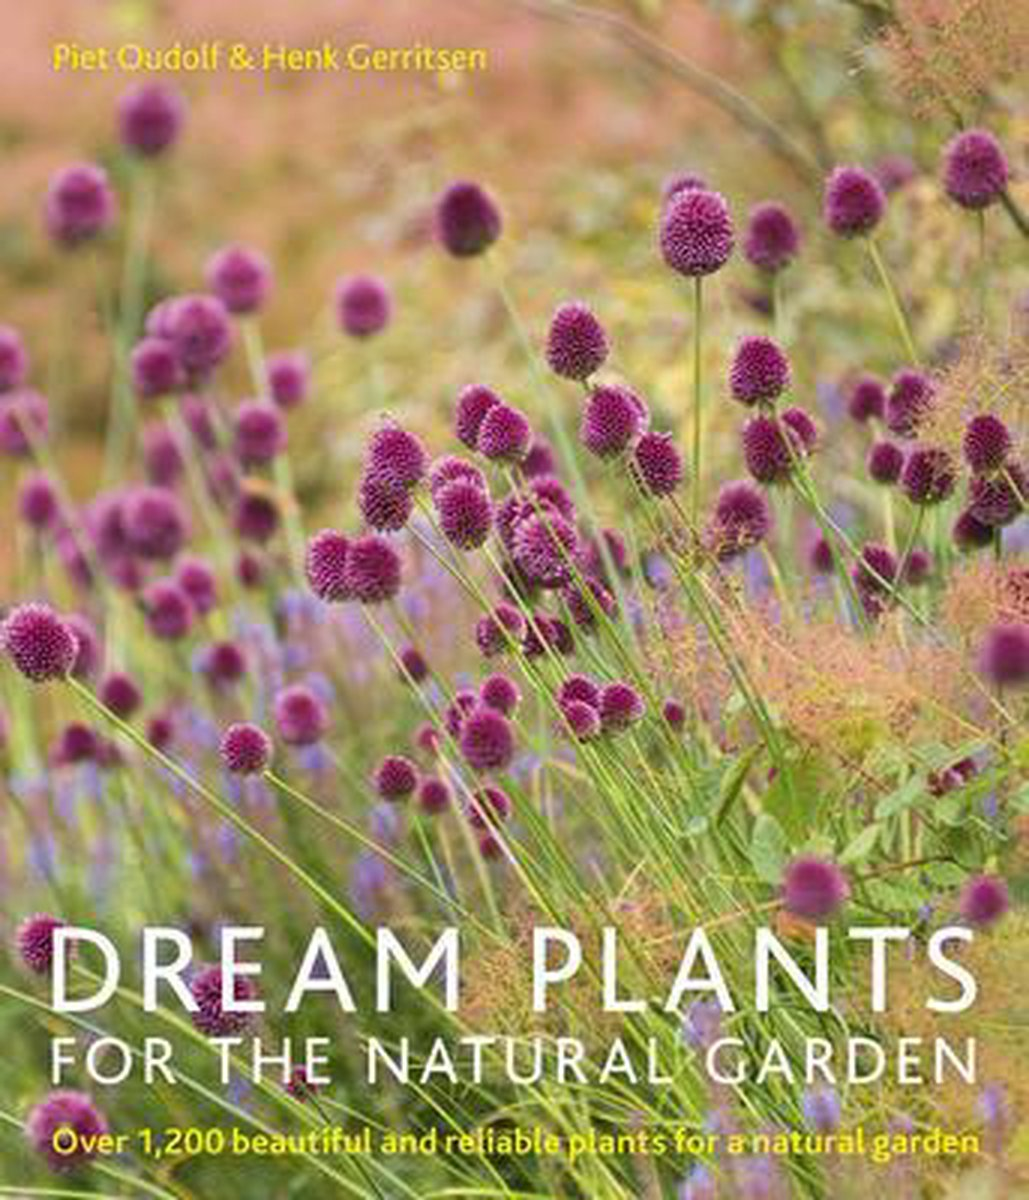 Dream Plants for the Natural Garden - Piet Oudolf